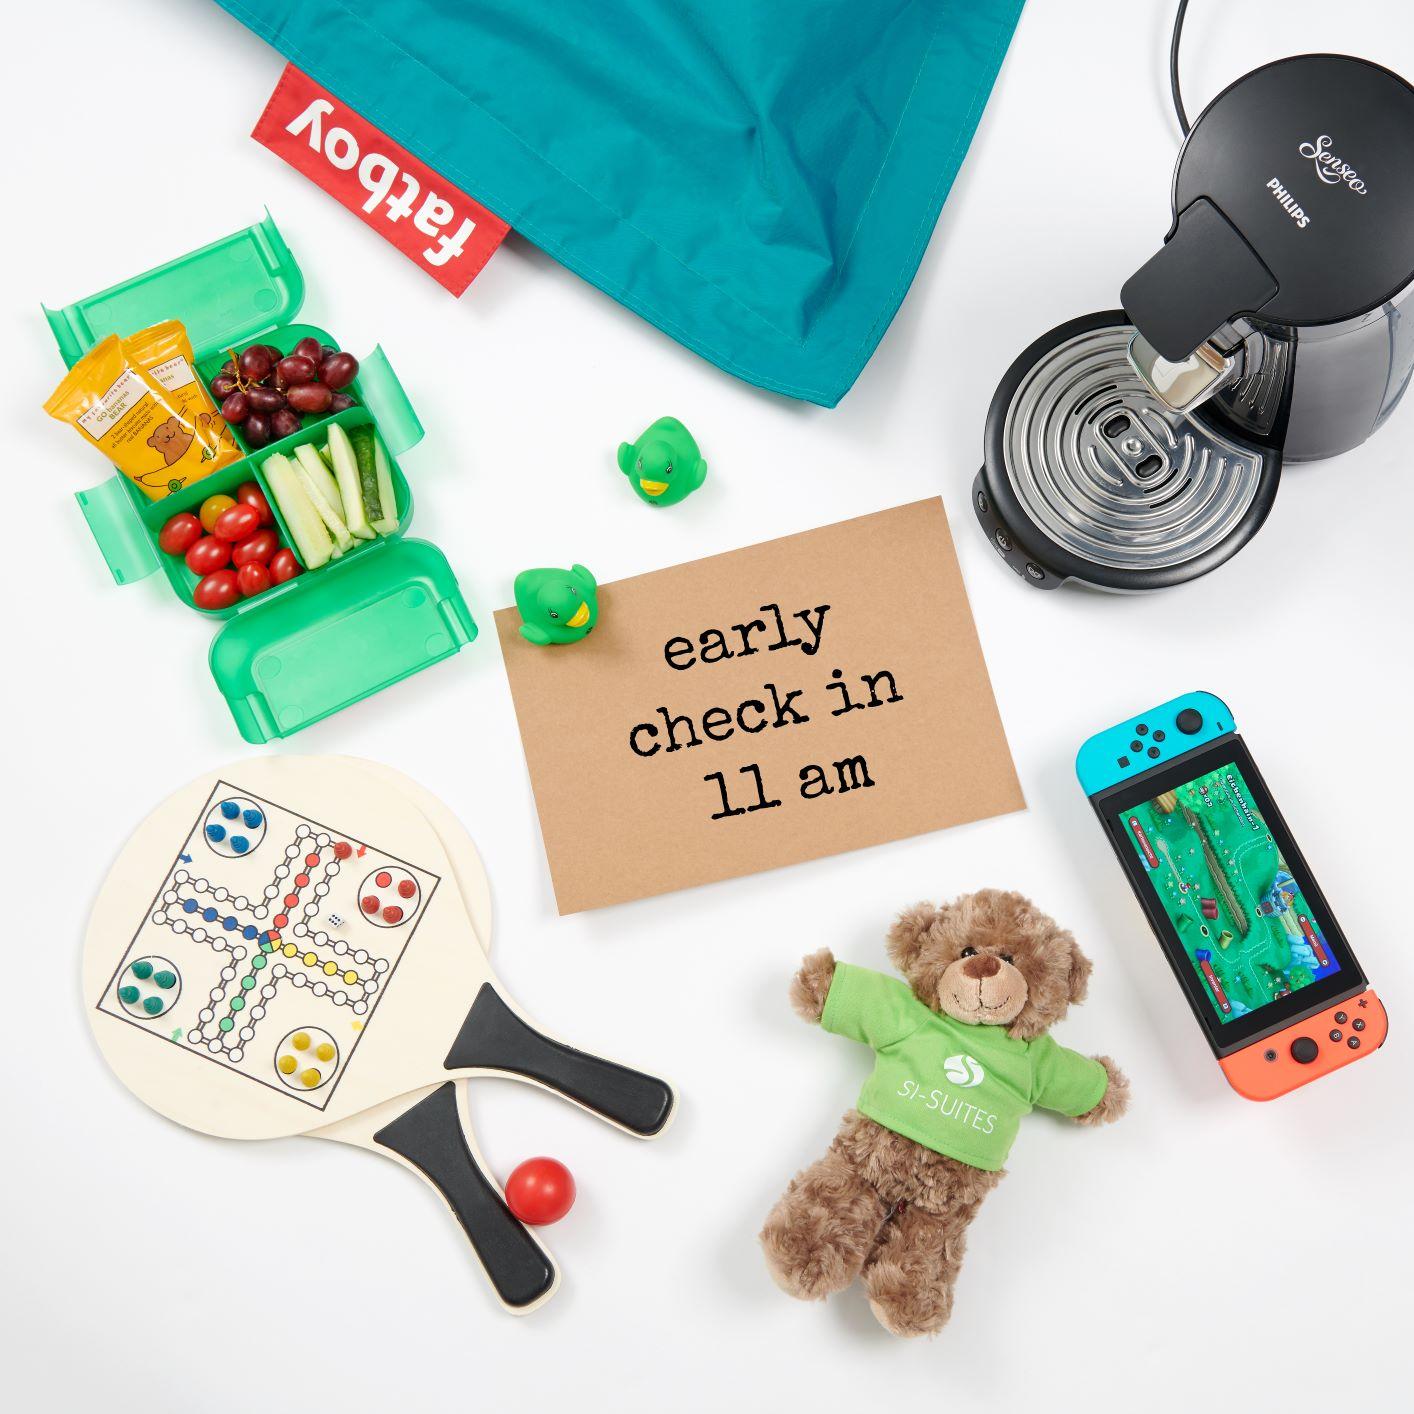 Beach game Lunch box Teddy bear Nintendo Senseo coffee maker arrival